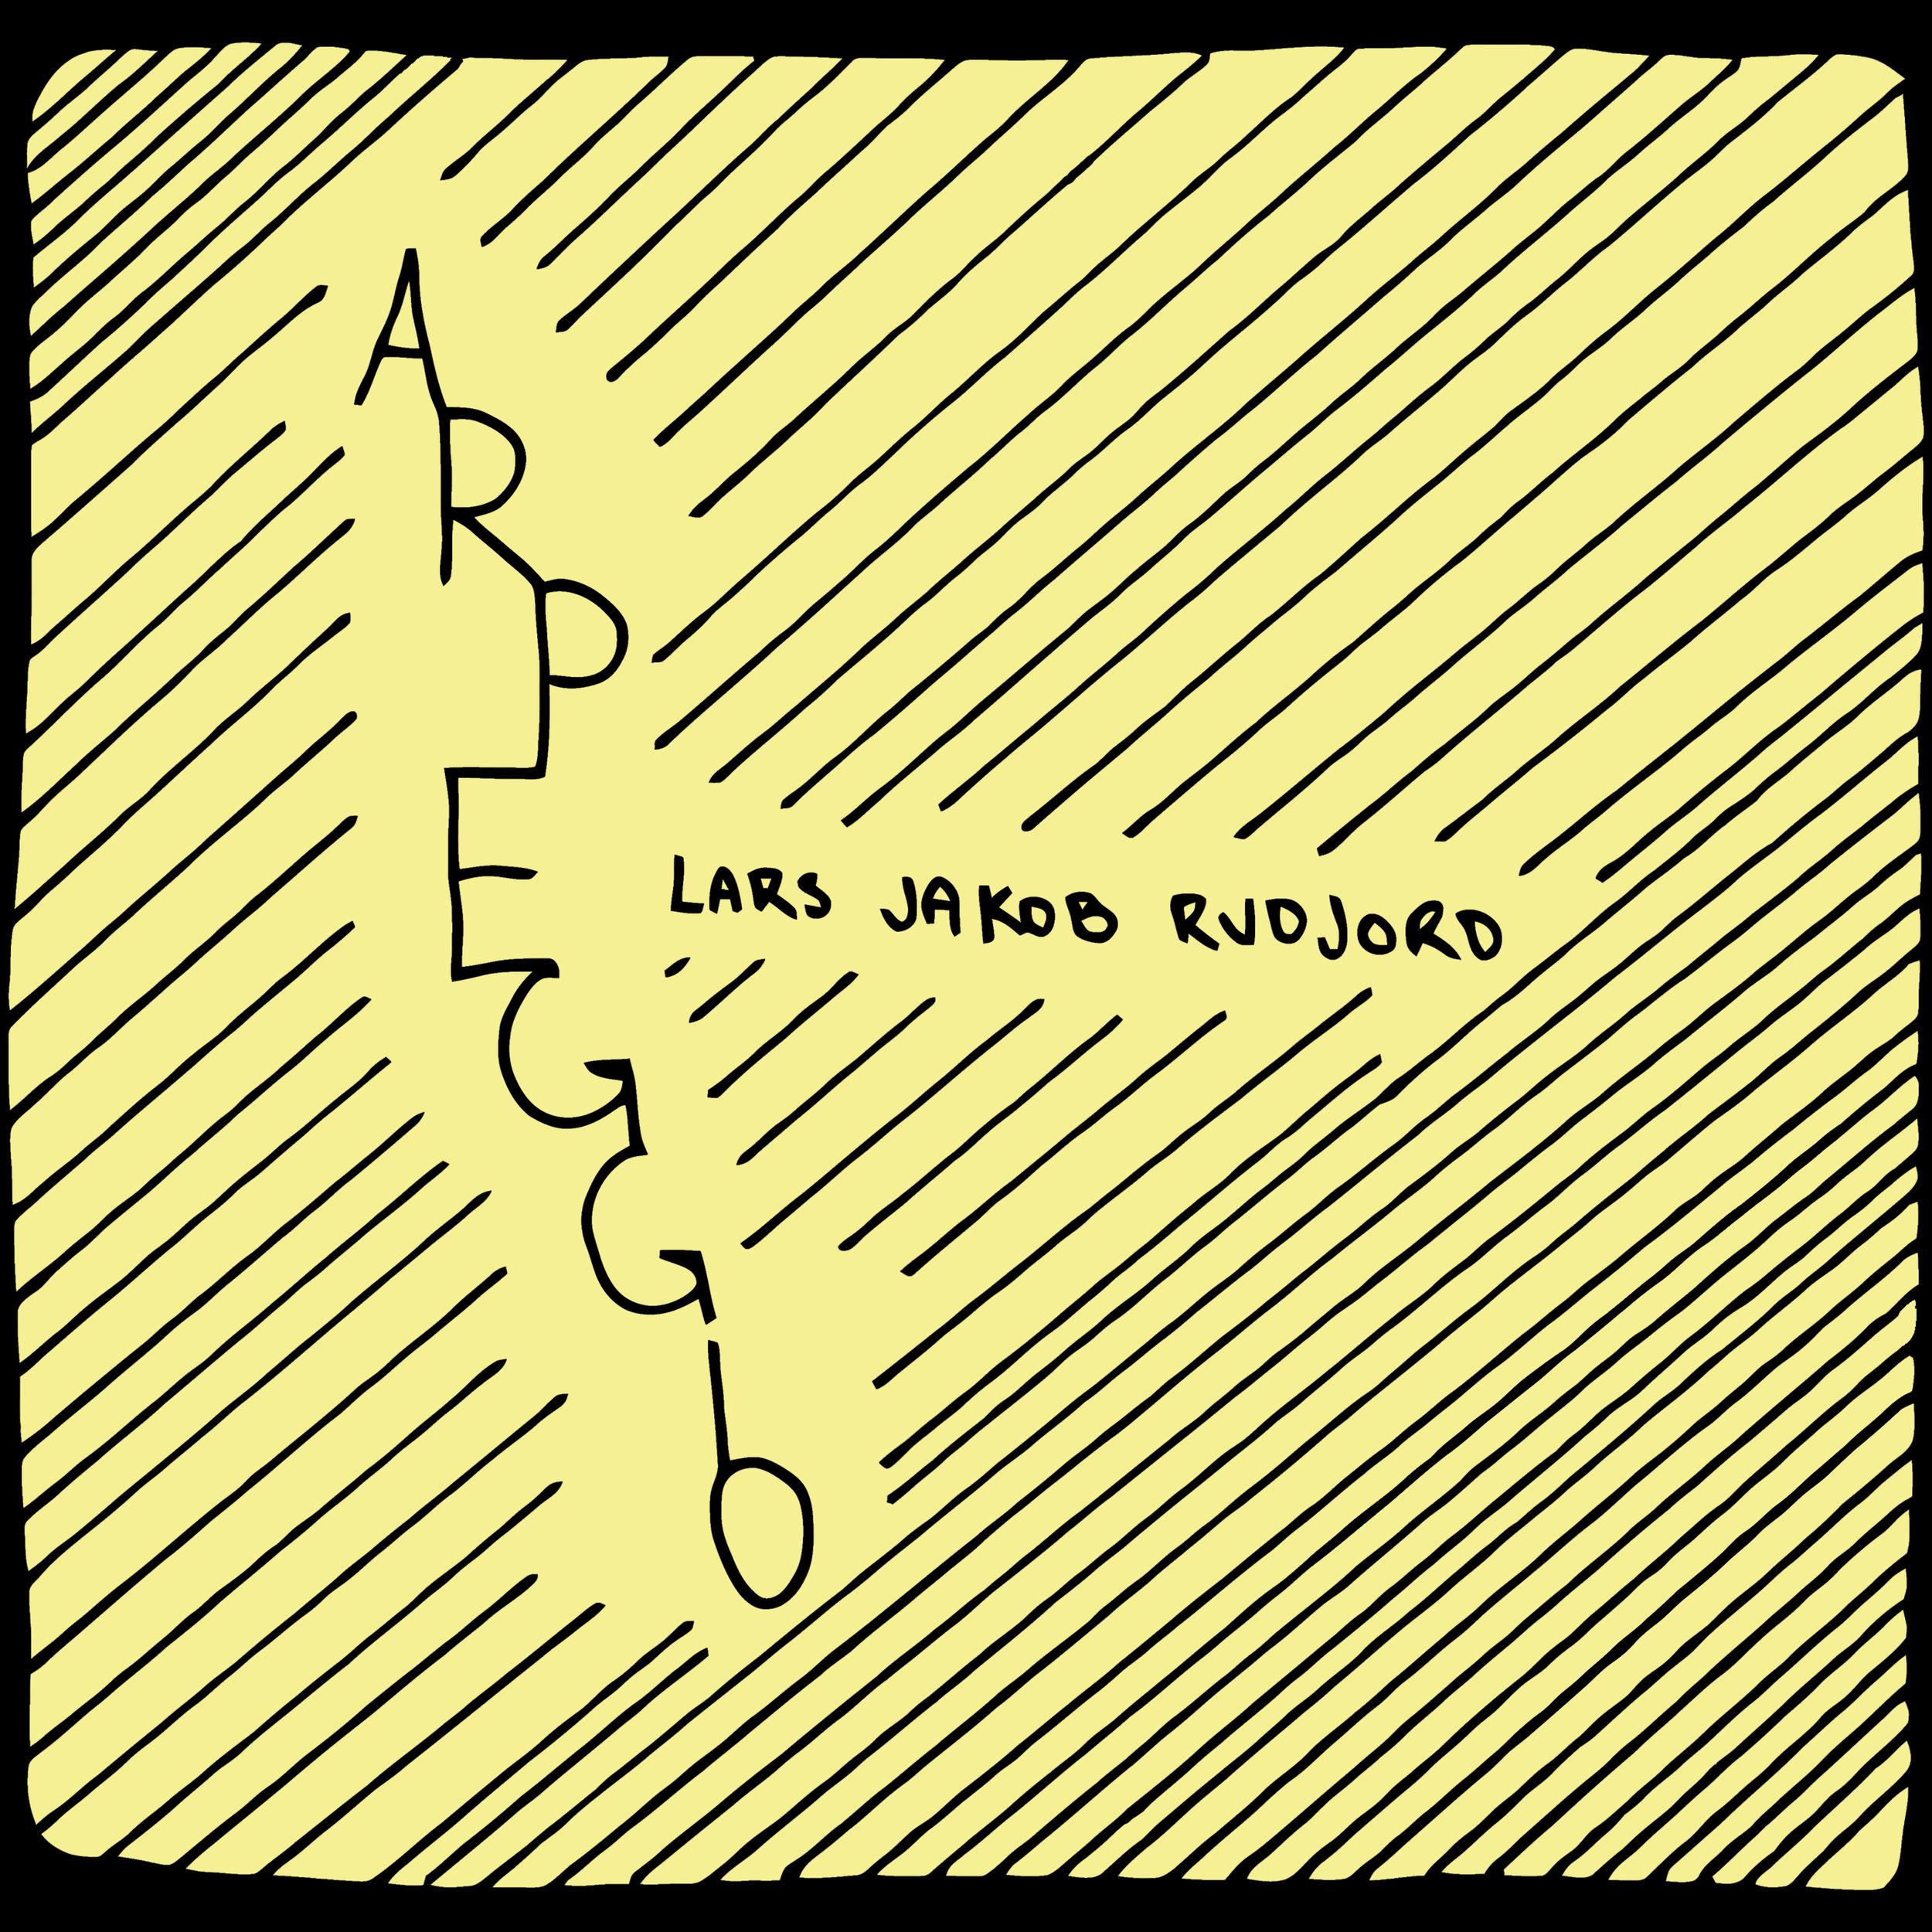 Lars Jakob Rudjord - Arpeggio EP Coverart.jpg